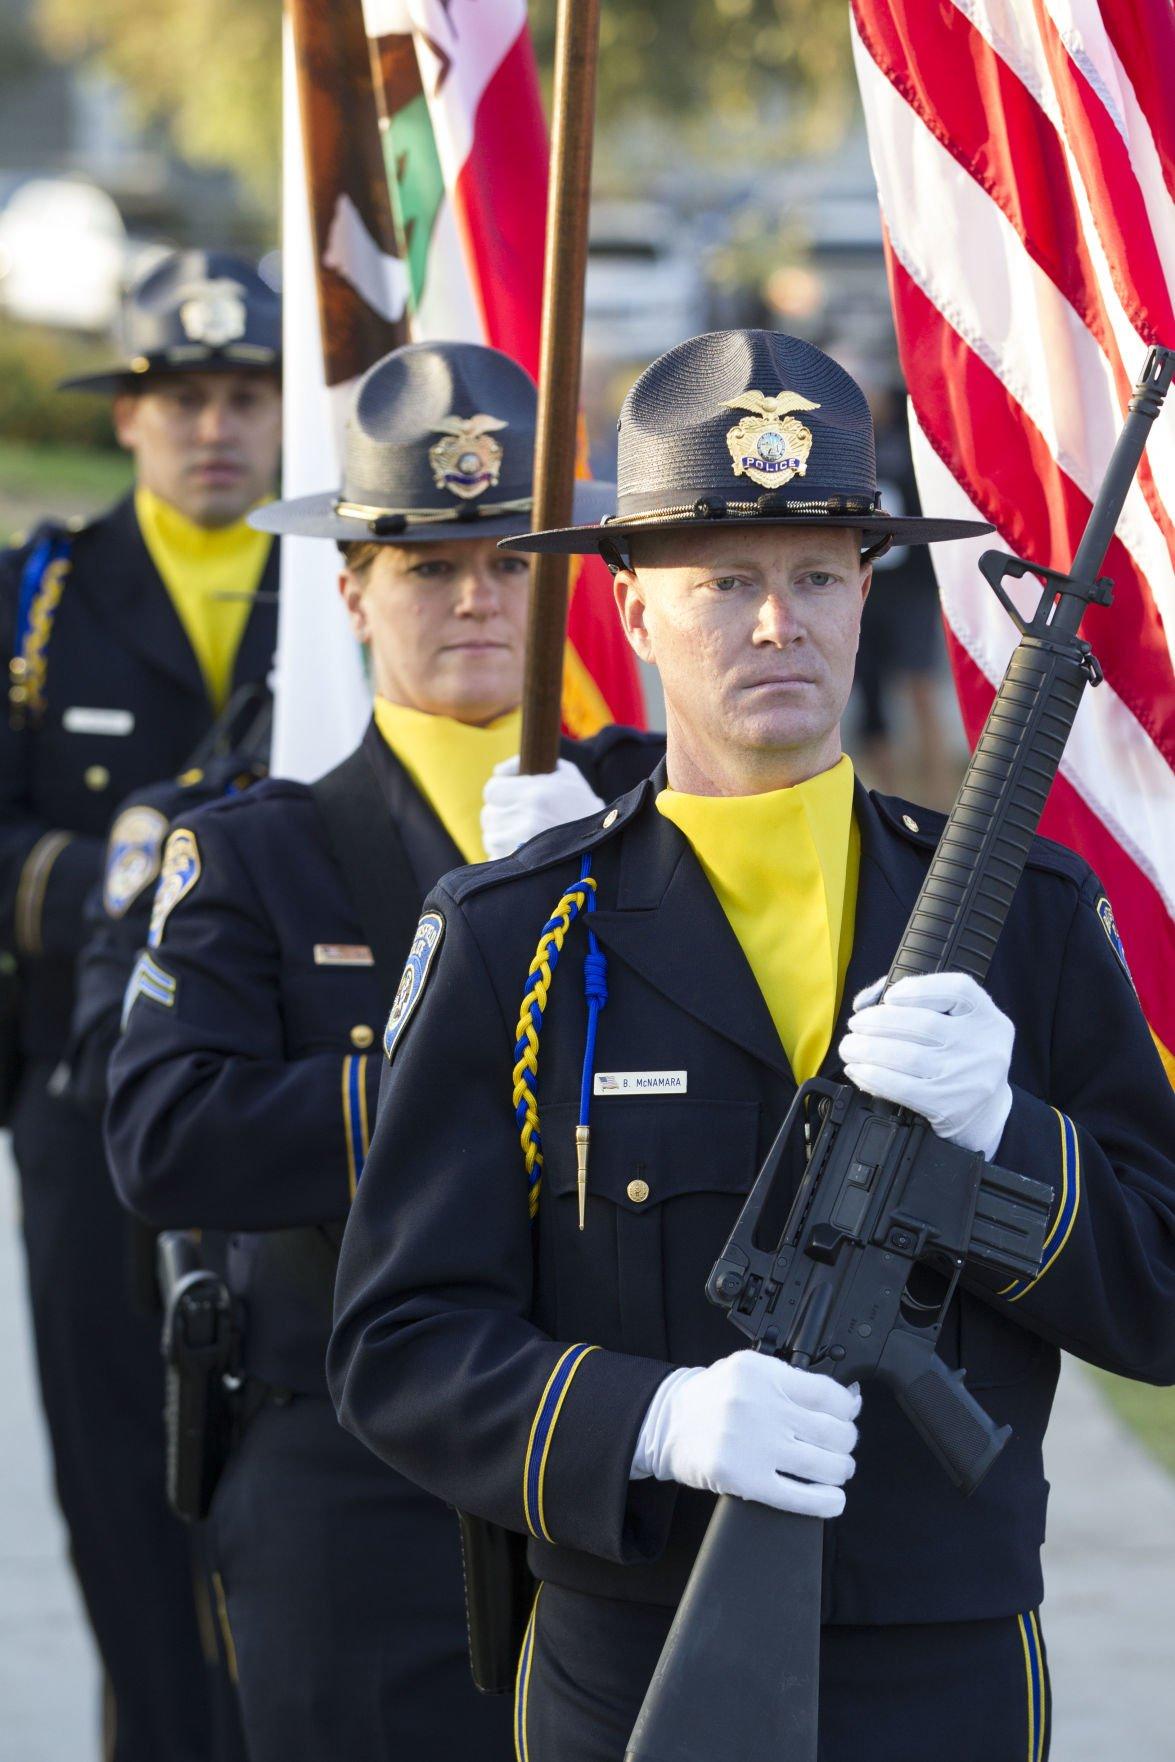 PHOTO GALLERY: 36th Annual Bakersfield Police Memorial Run